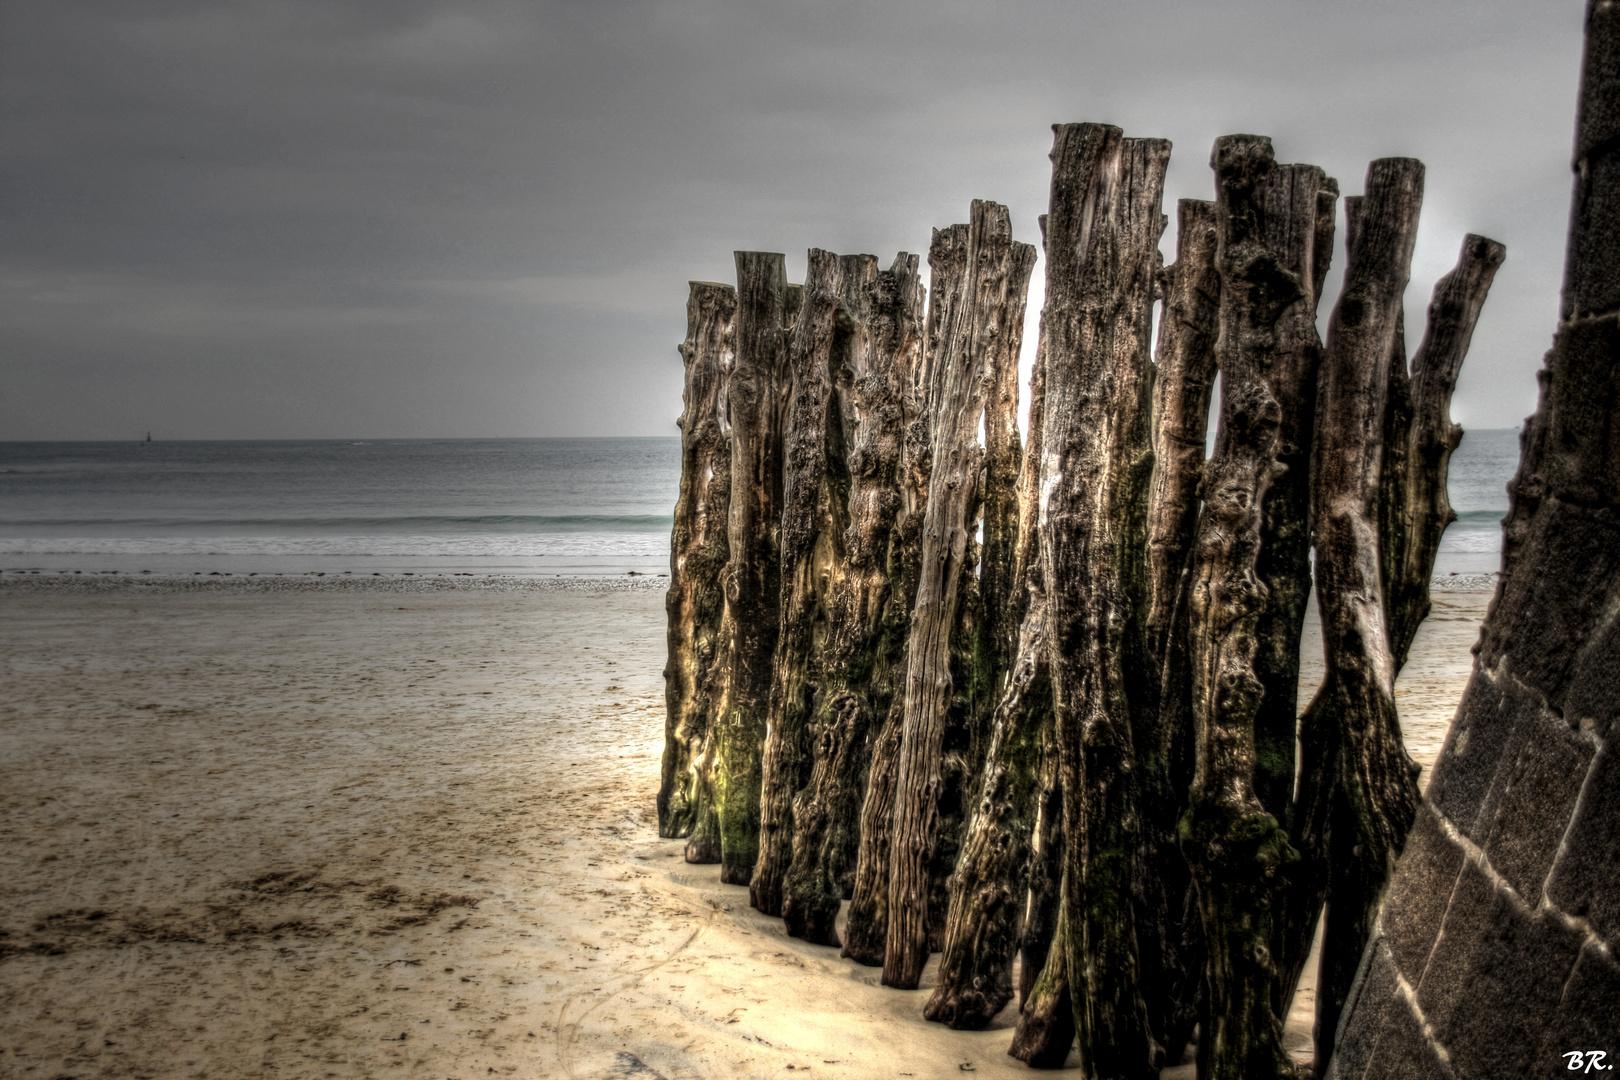 à regarder la mer (3)